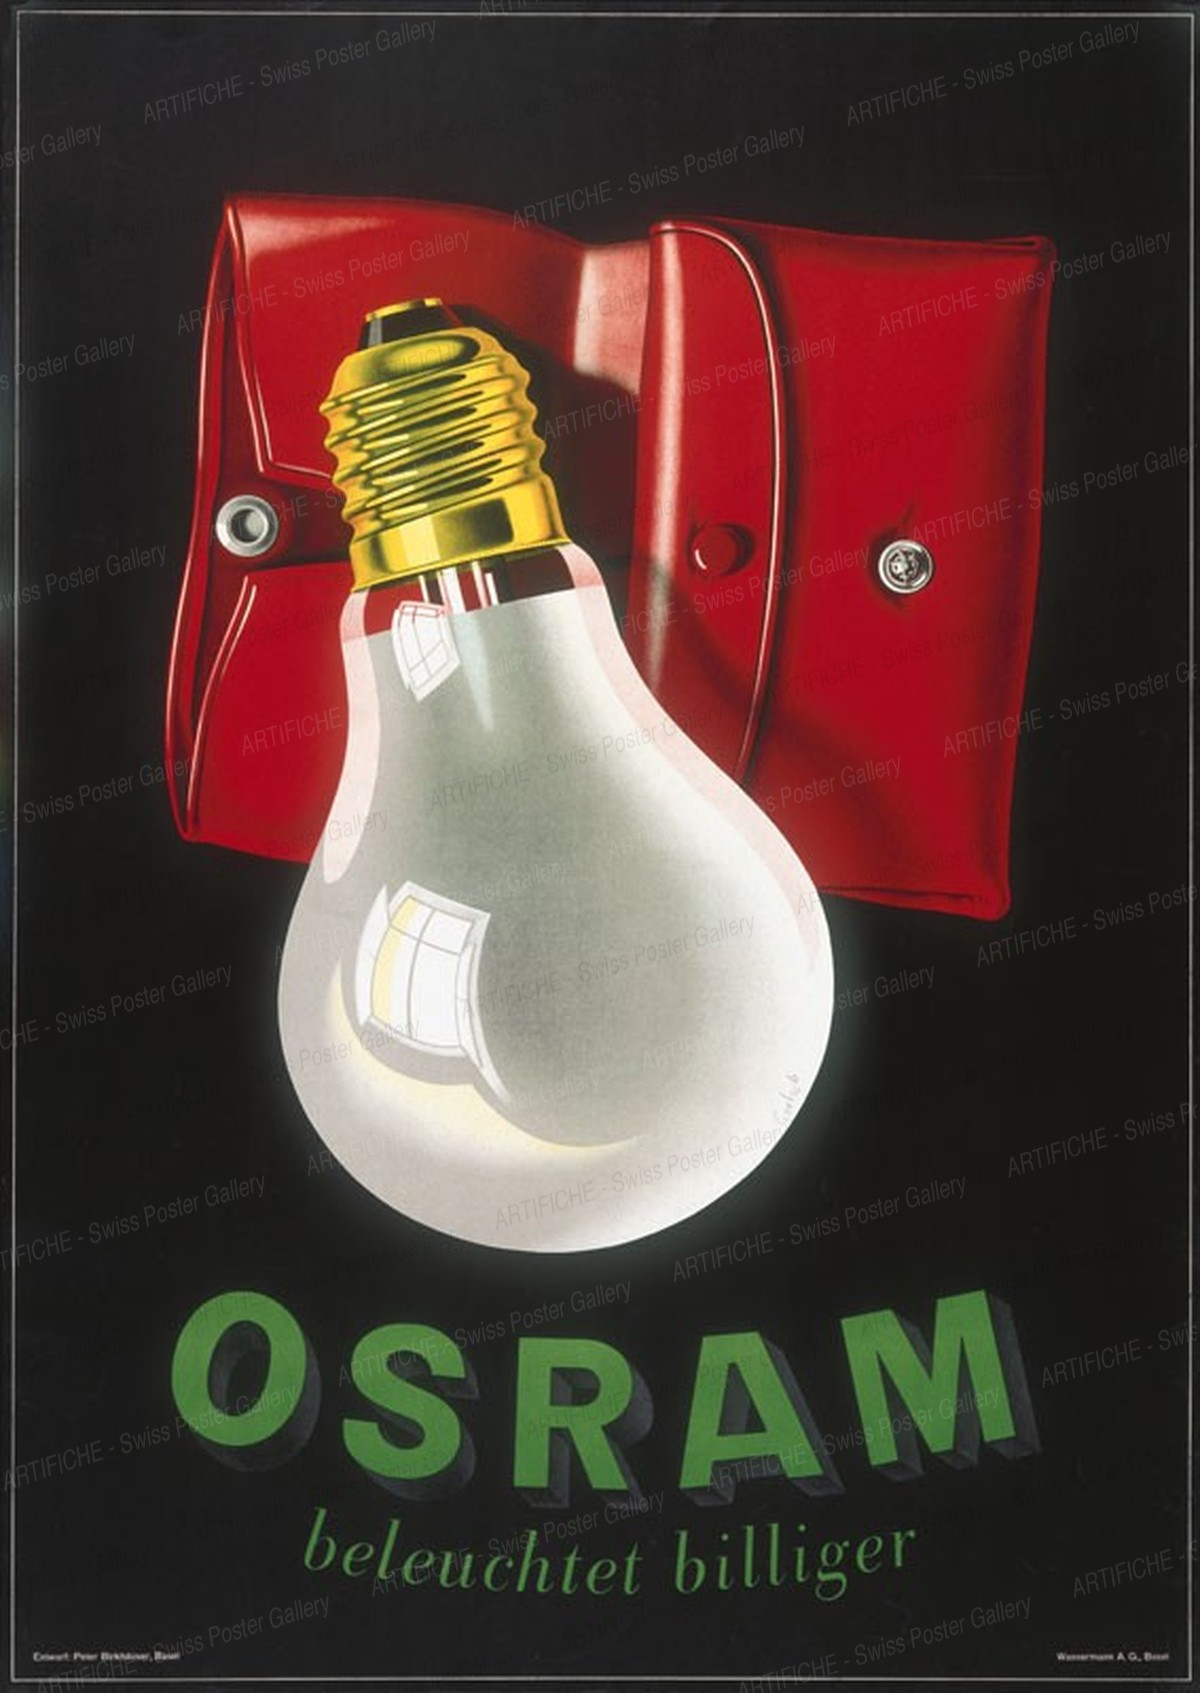 OSRAM beleuchtet billiger, Peter Birkhäuser